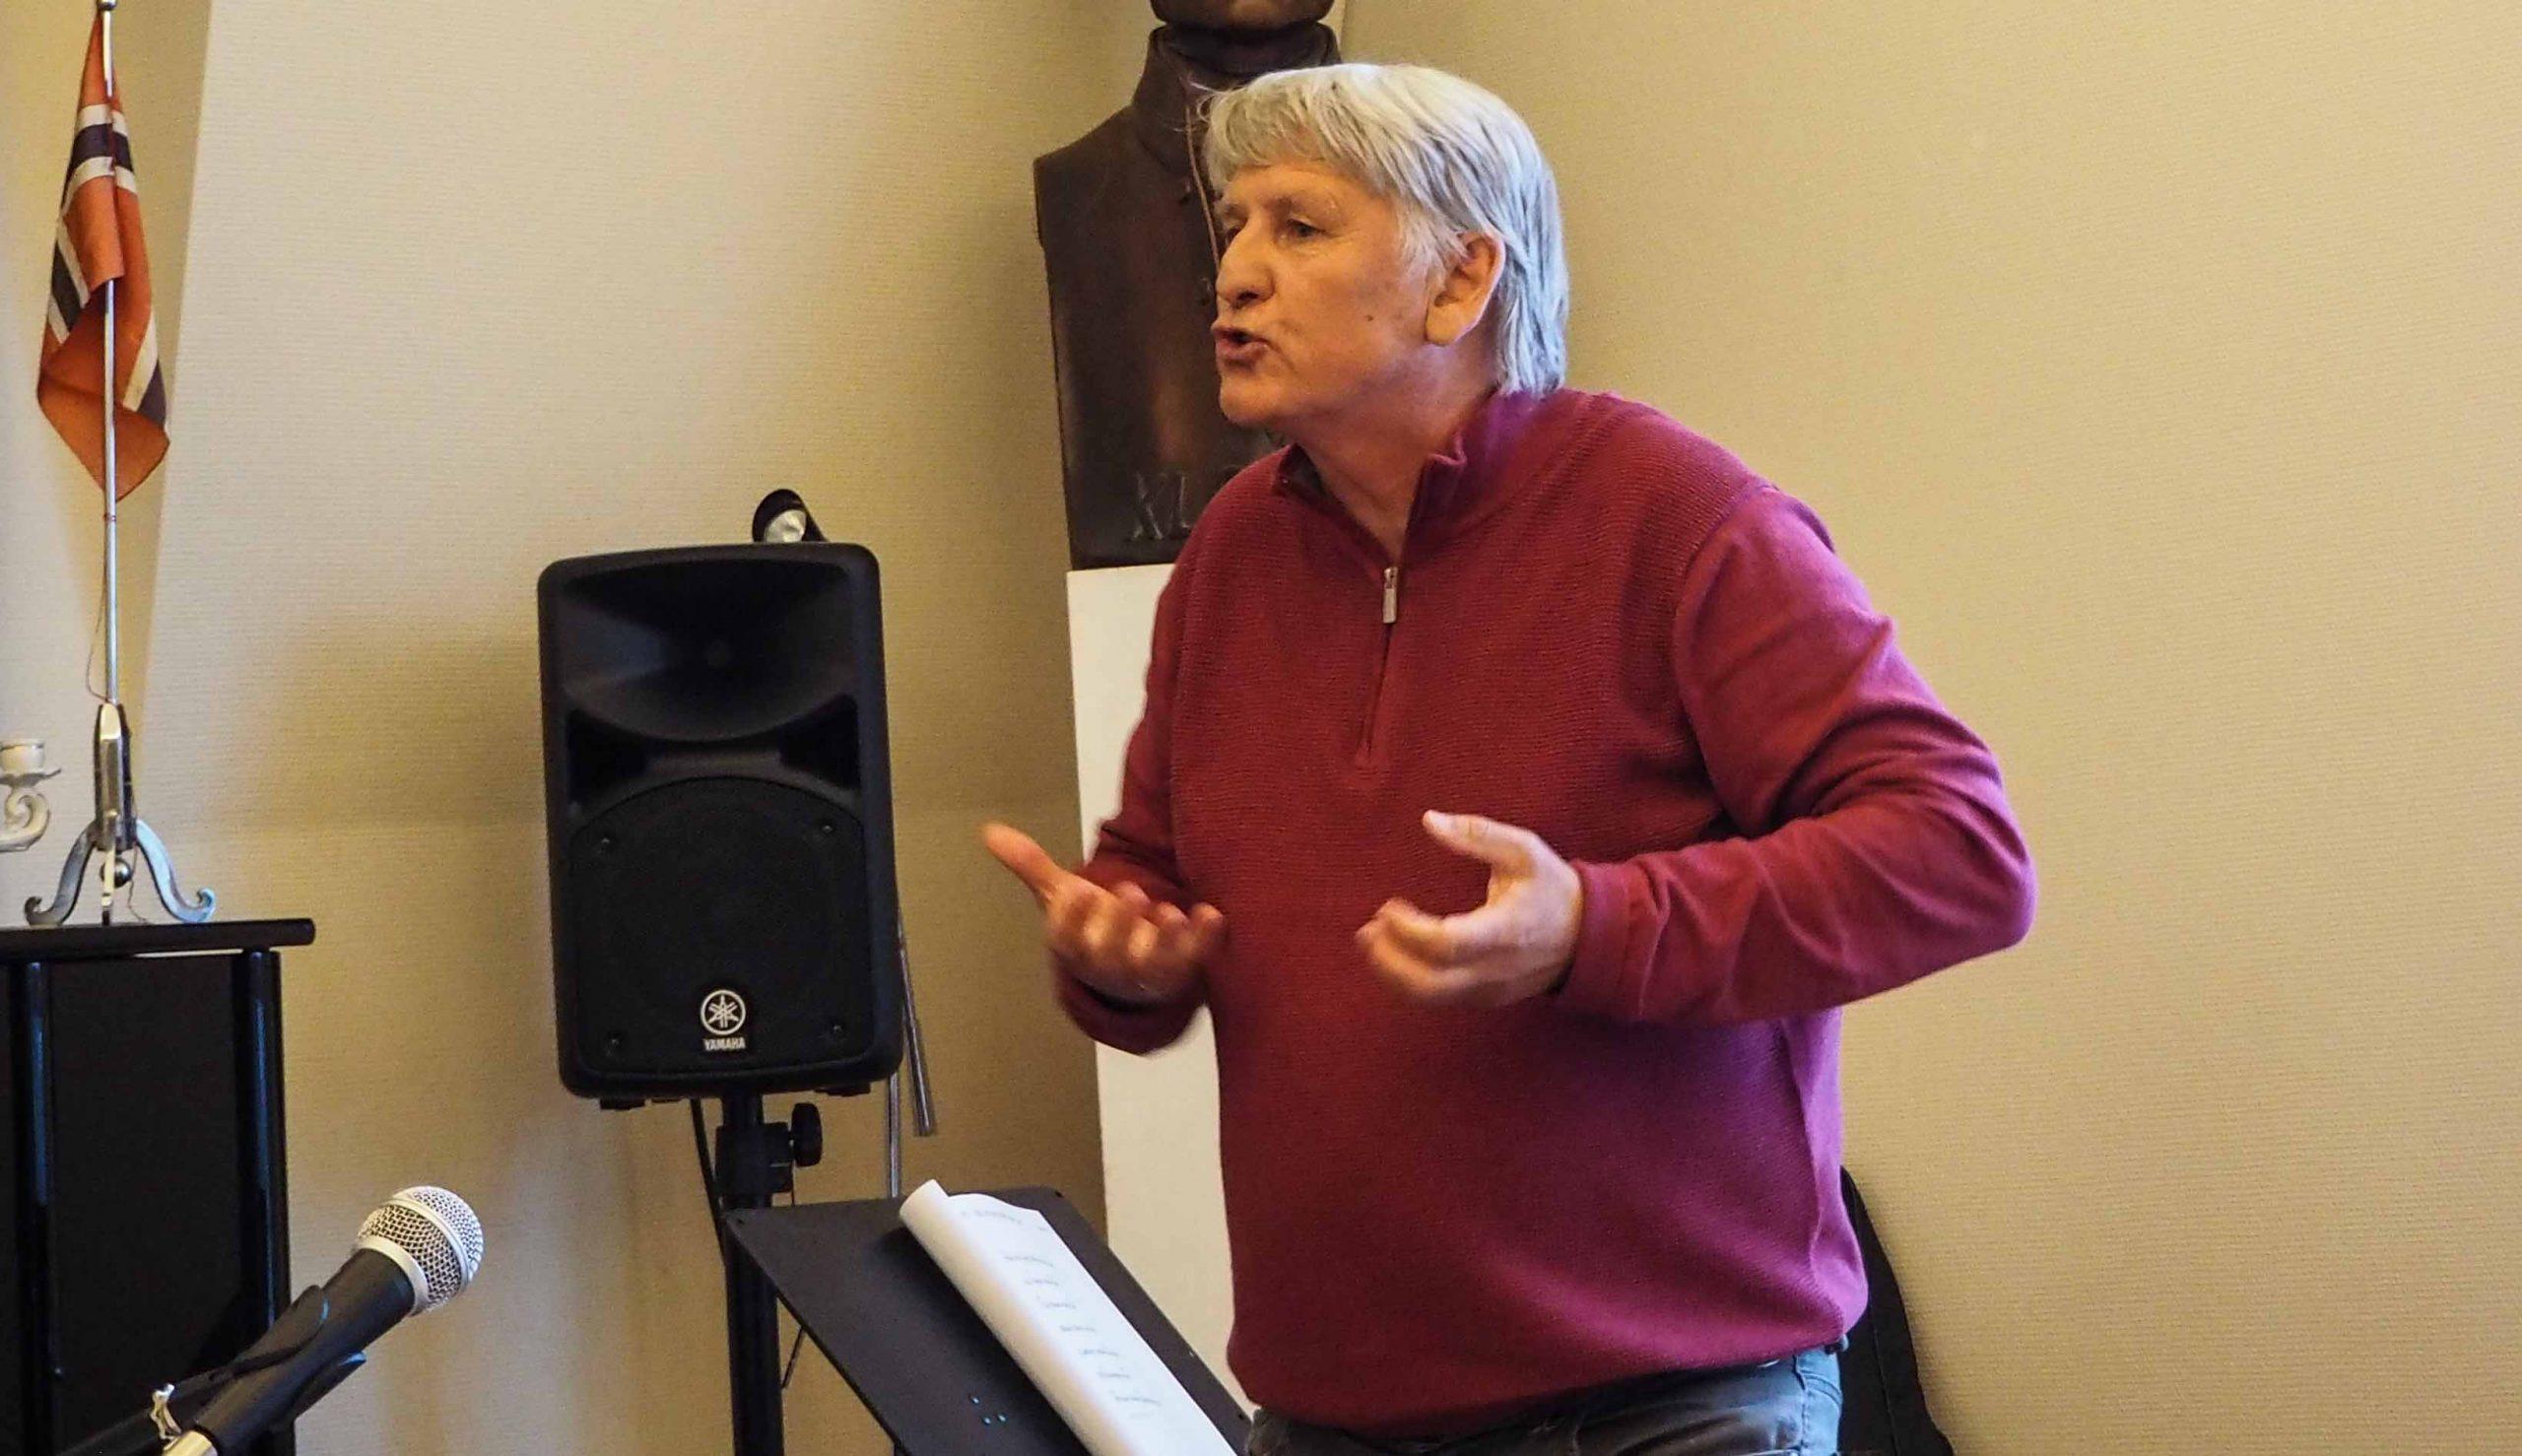 Jesus fest 9. mai 2020. Rolf Aarstad talte inspirerende om kraften i Den hellige ånd.